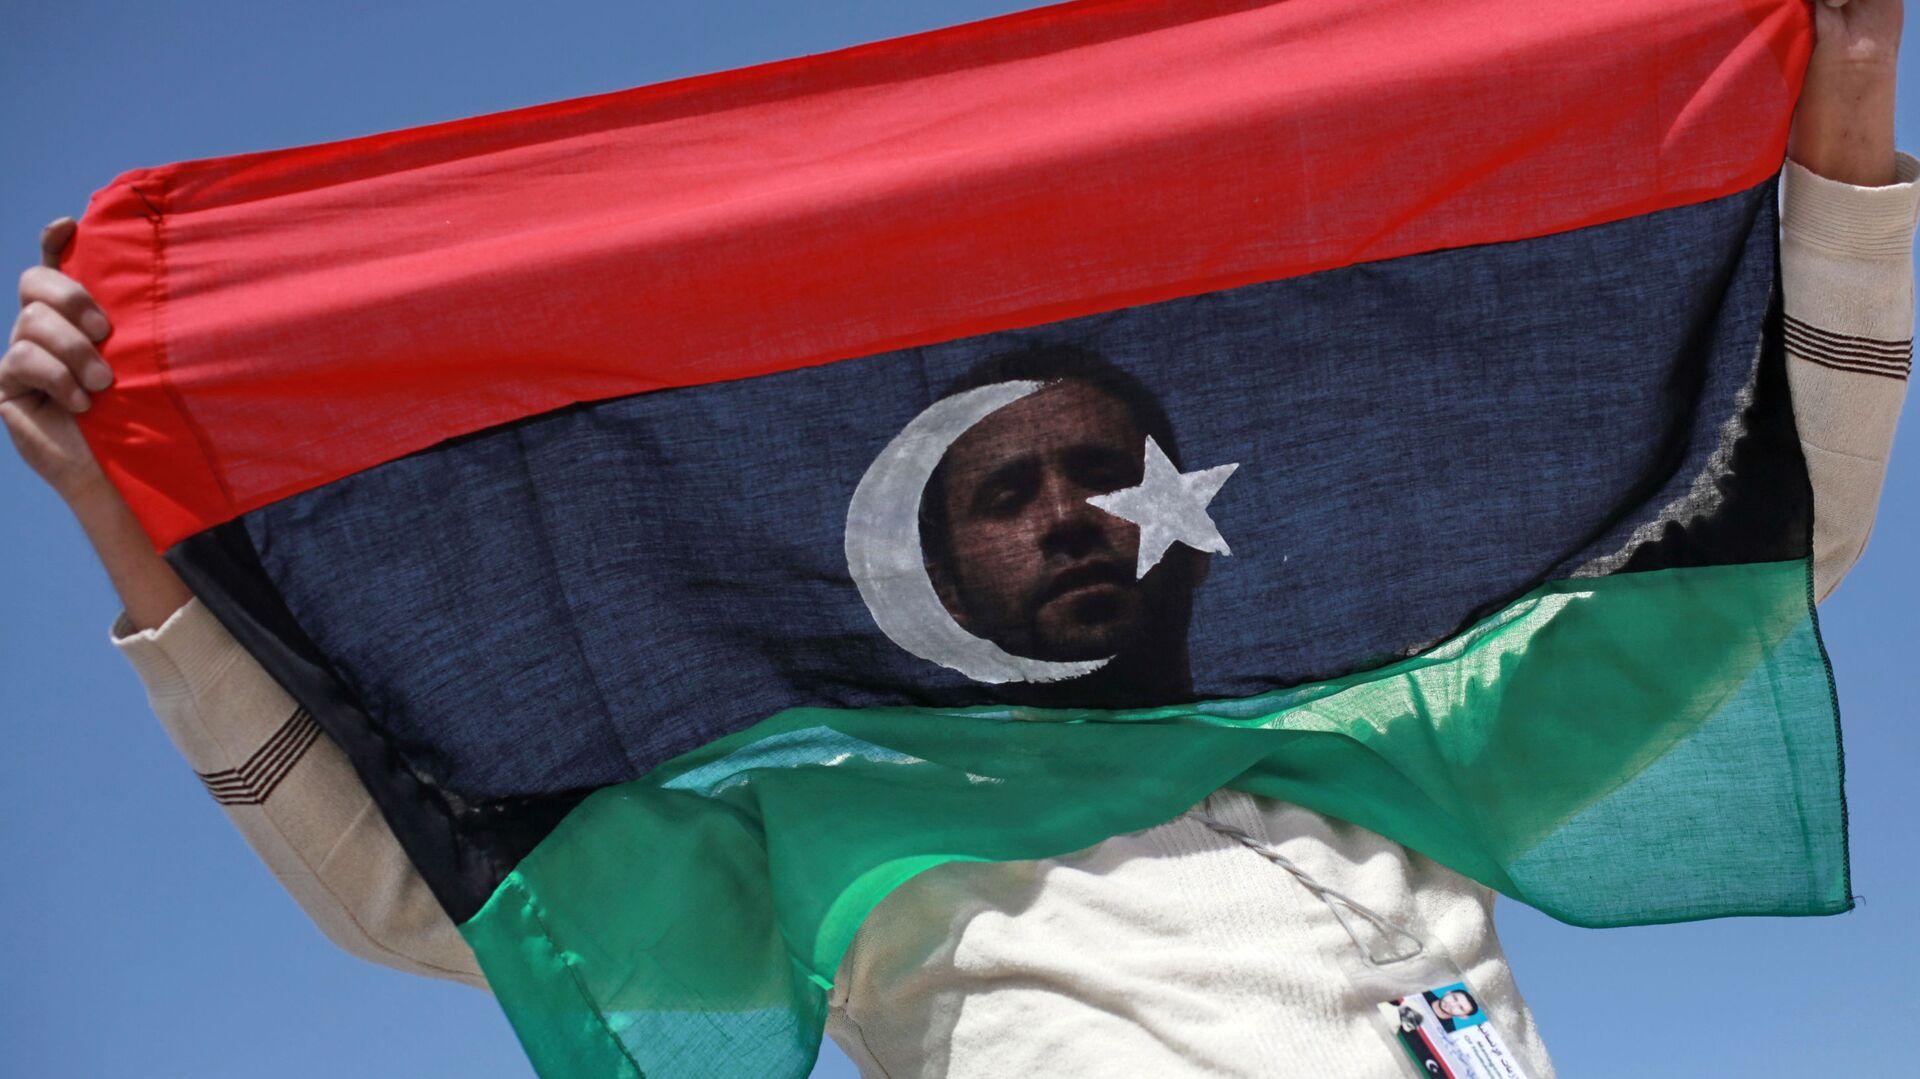 La crisi in Libia - Sputnik Italia, 1920, 15.02.2021